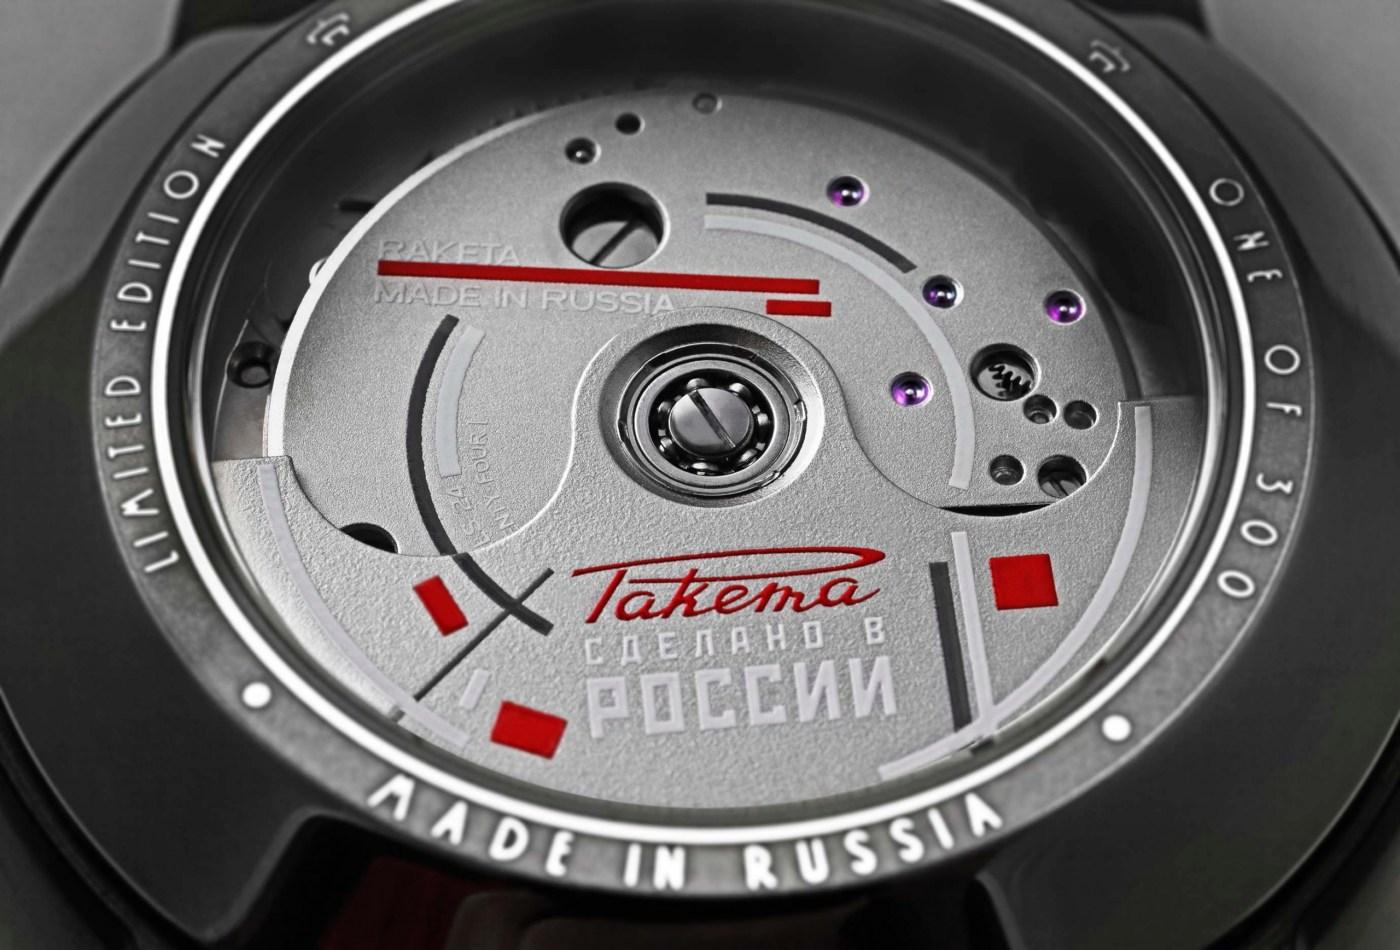 Raketa Avant-Garde Limited Edition 0279 movement